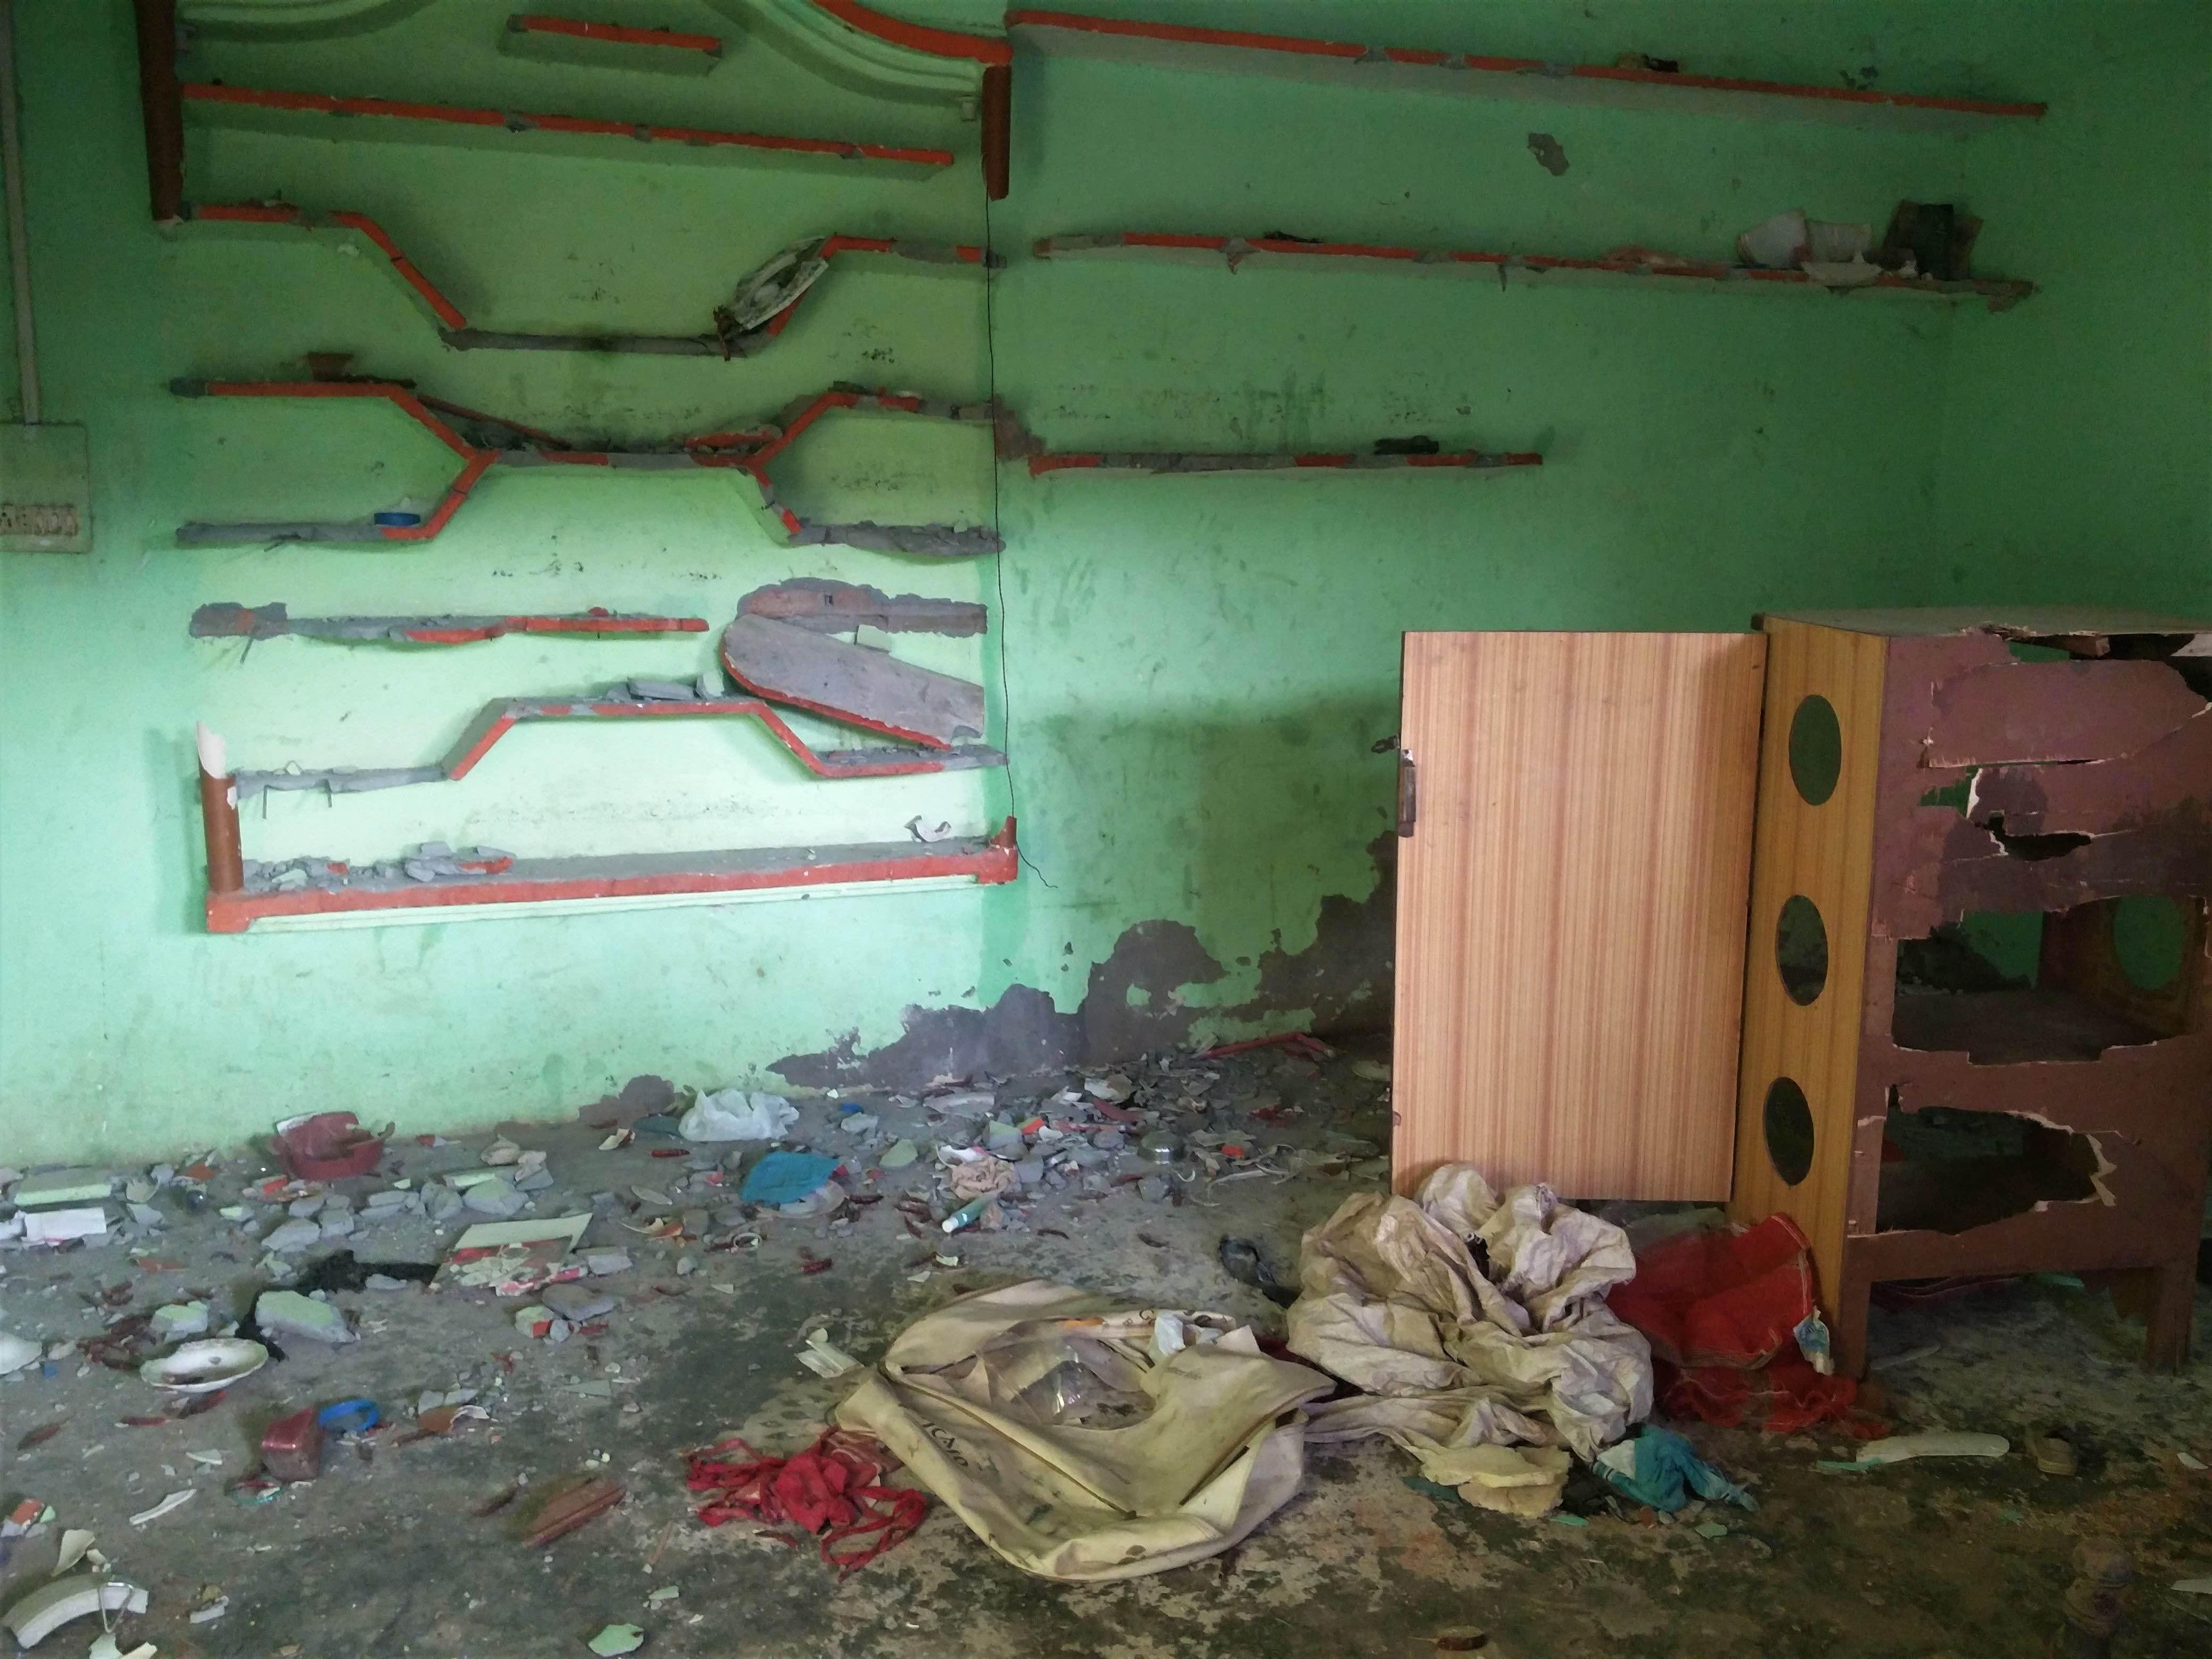 Sabir's vandalised house. Credit: Neha Dixit